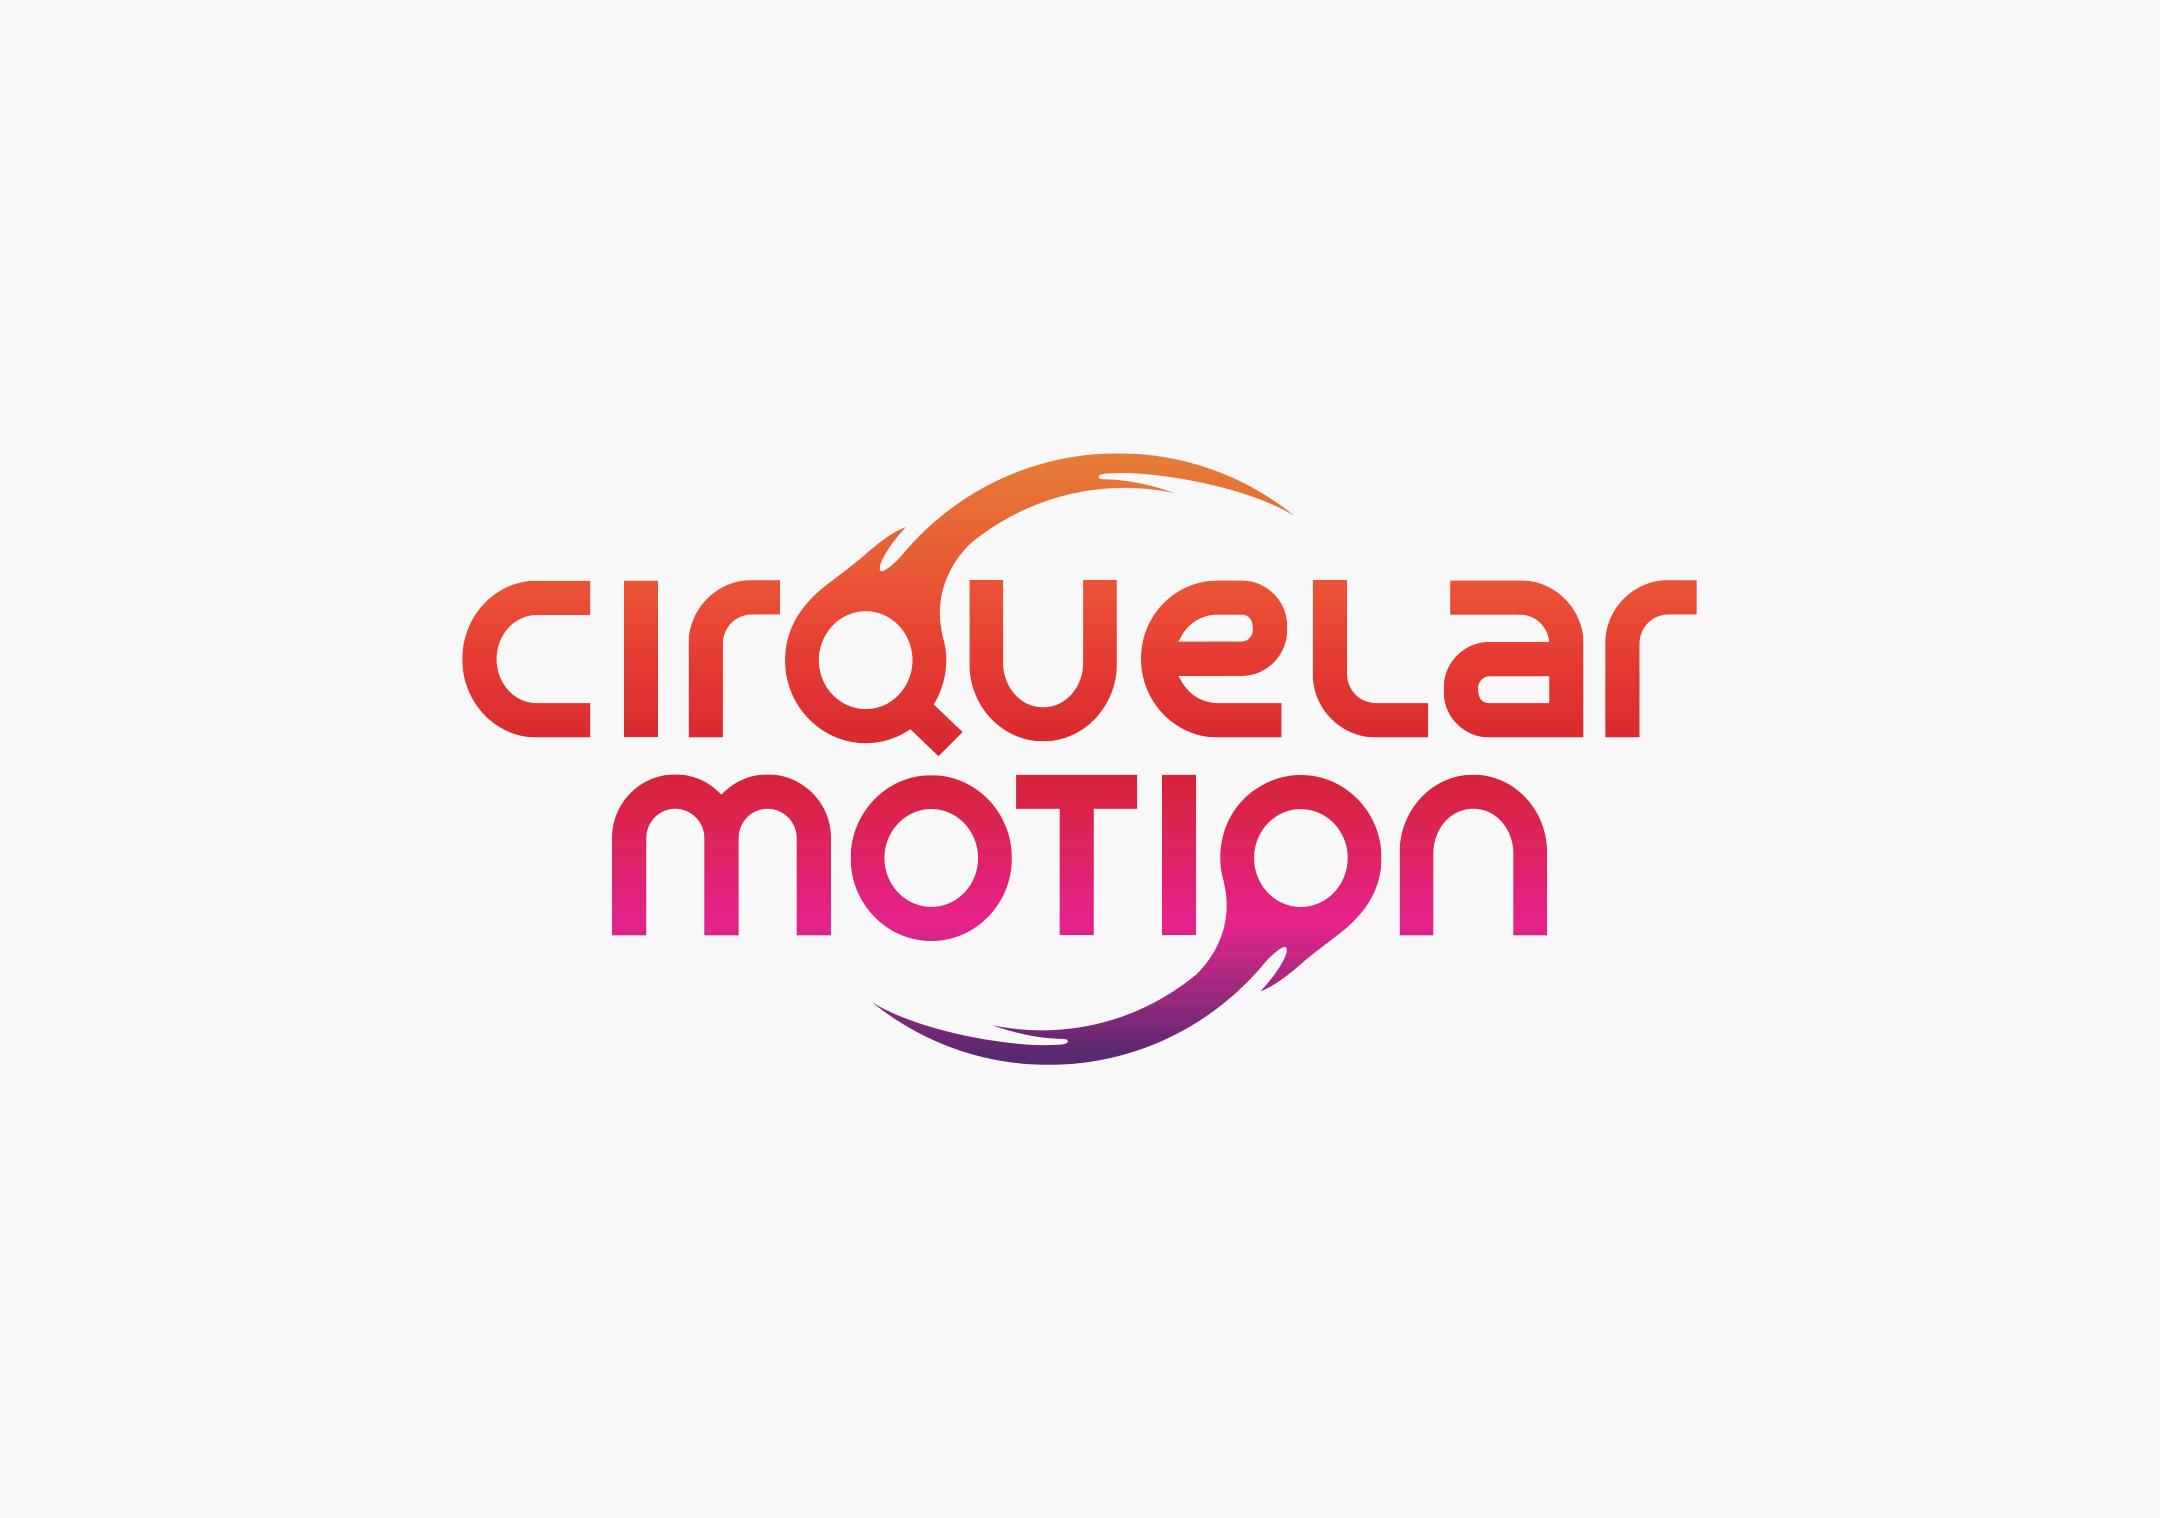 cirquelar_motion_1